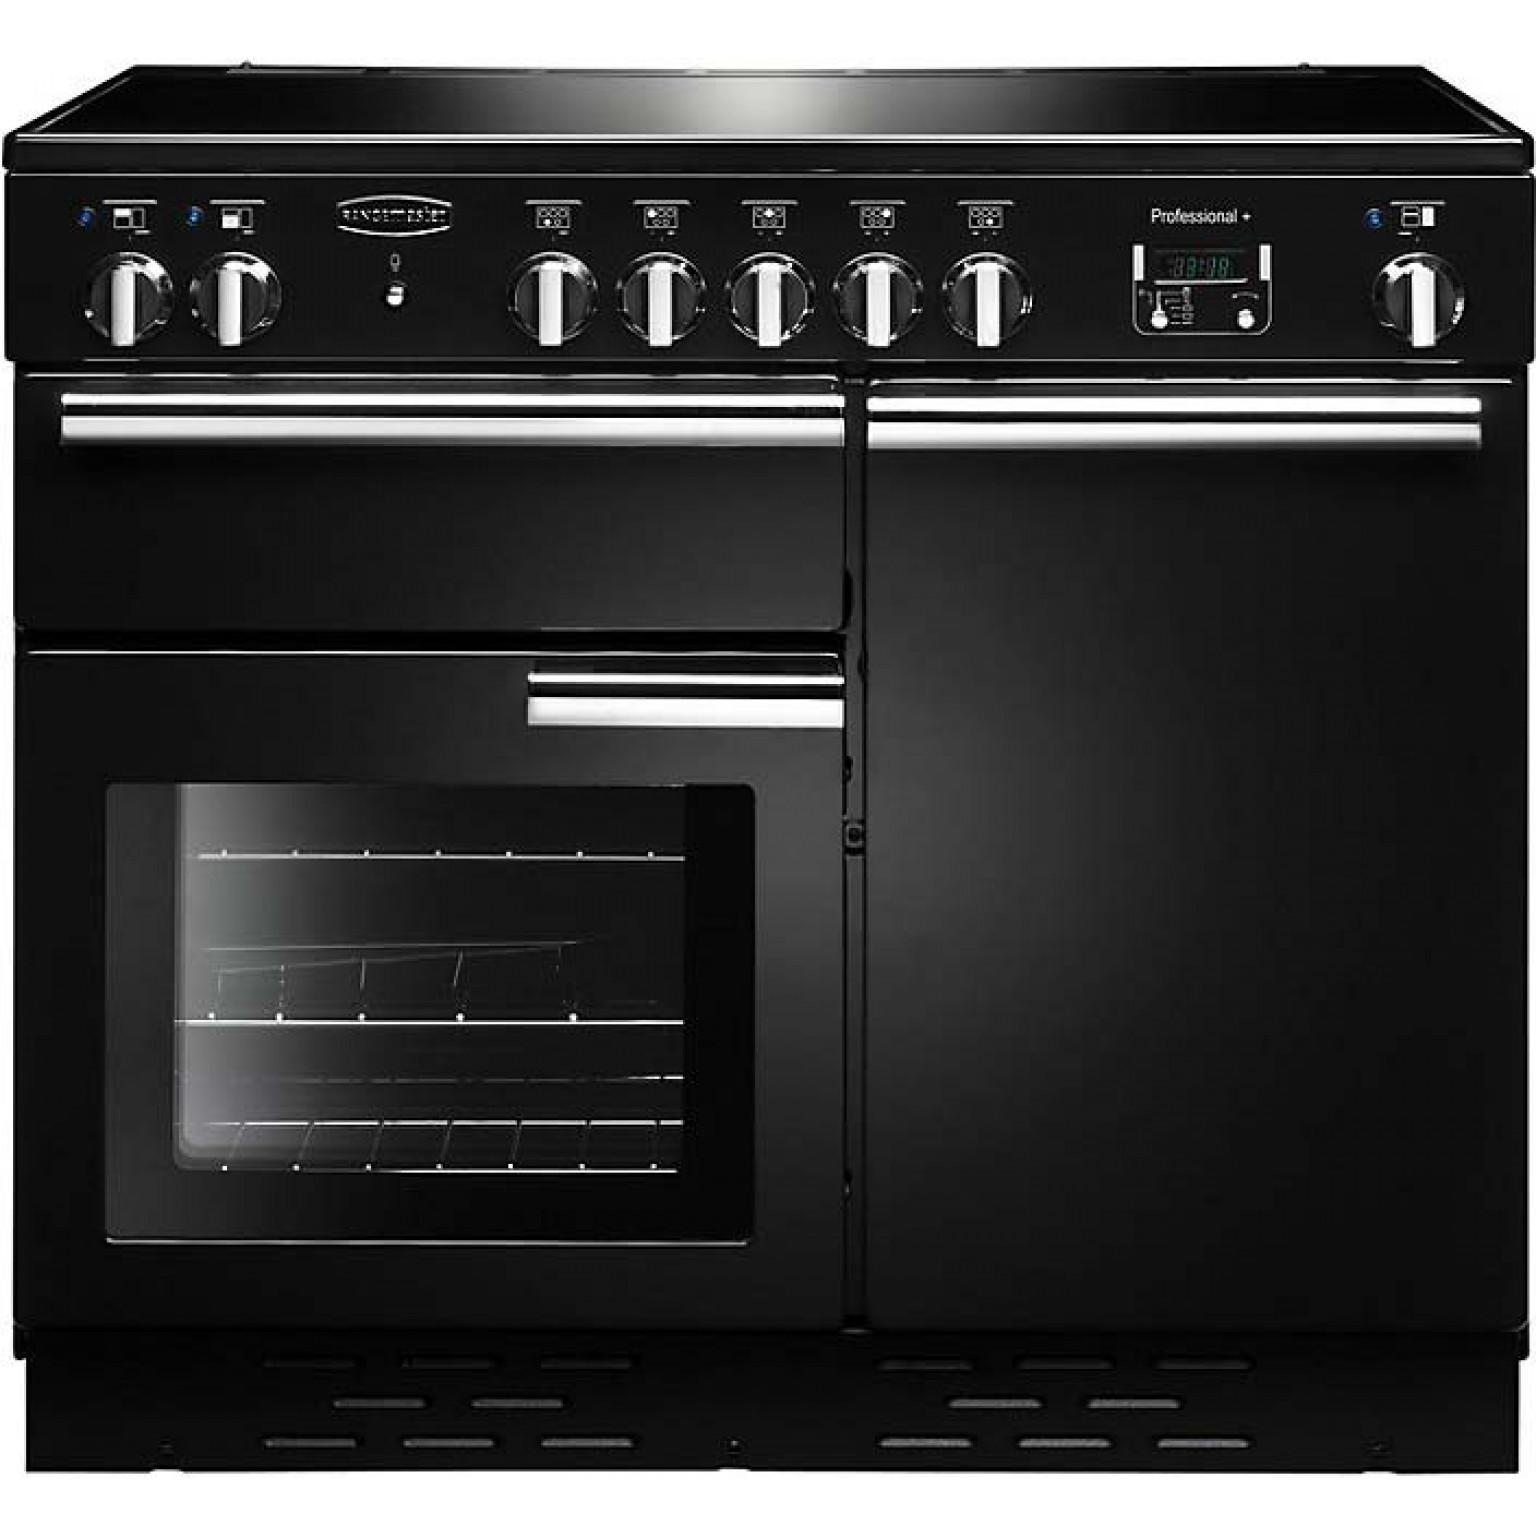 Rangemaster Professional+ 100cm all electric range cooker PROP100EC